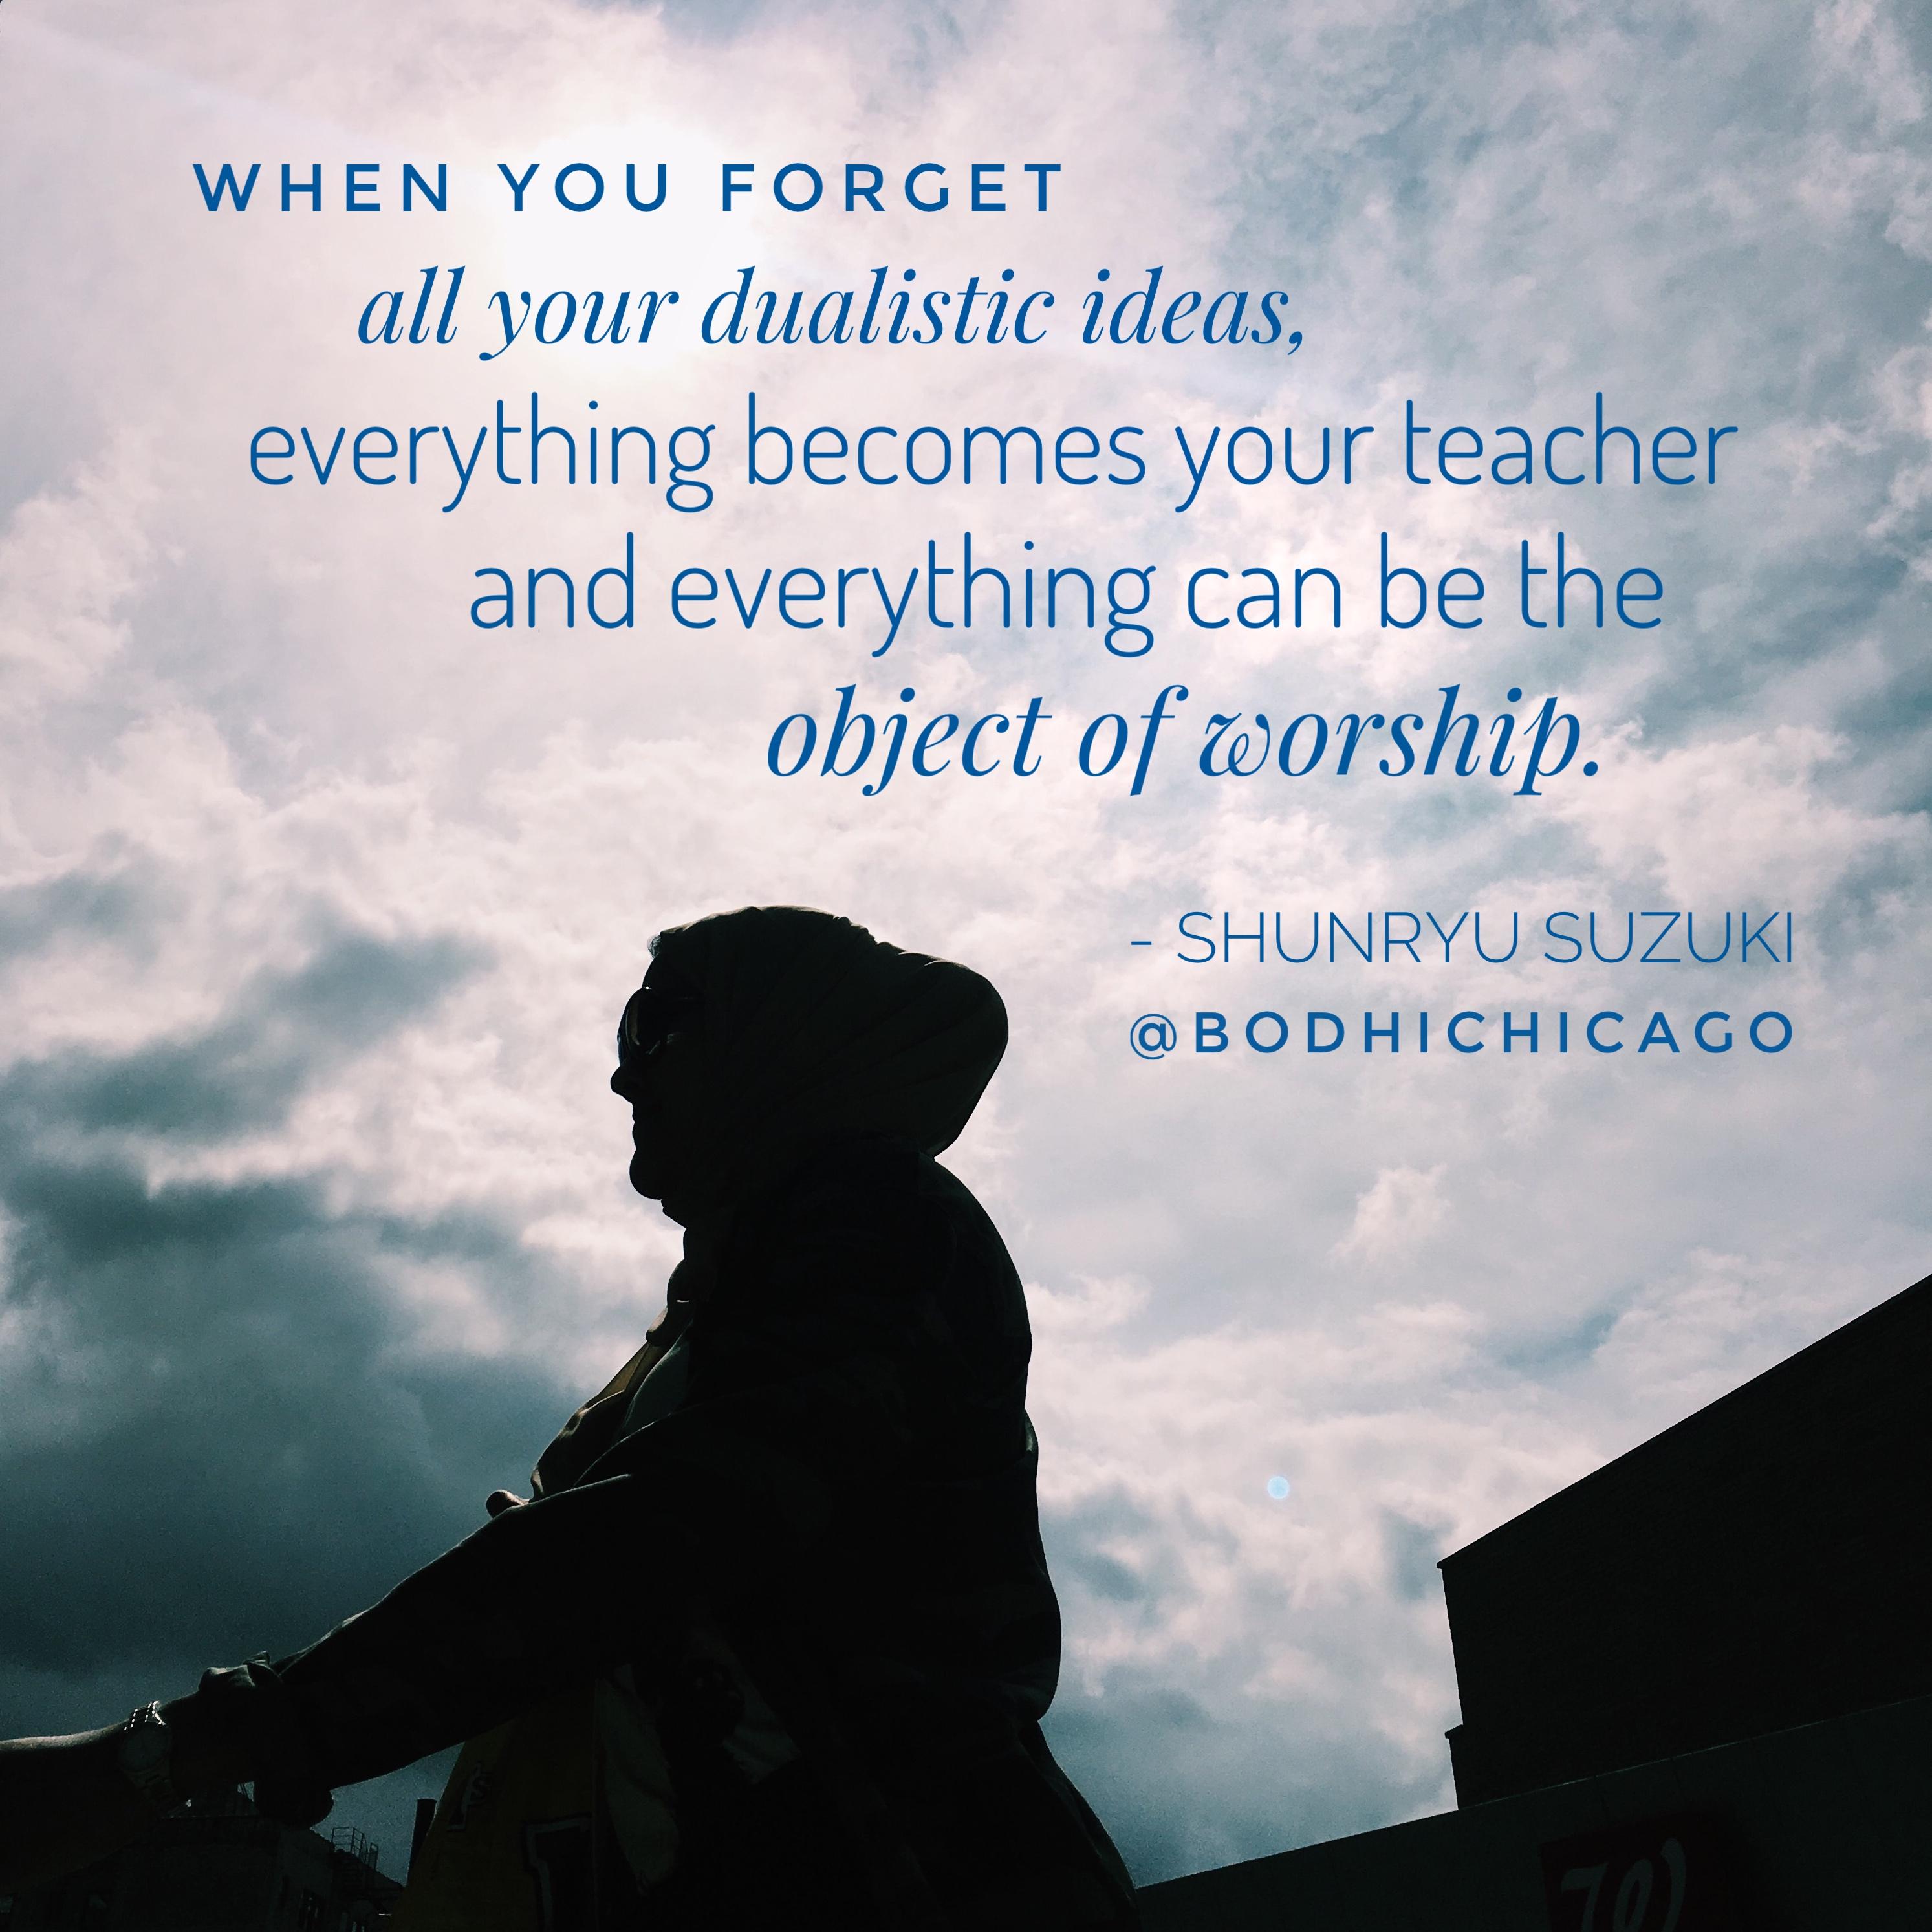 Wednesday Wisdom Quote Shunryu Suzuki On Forgetting Dualistic Ideas